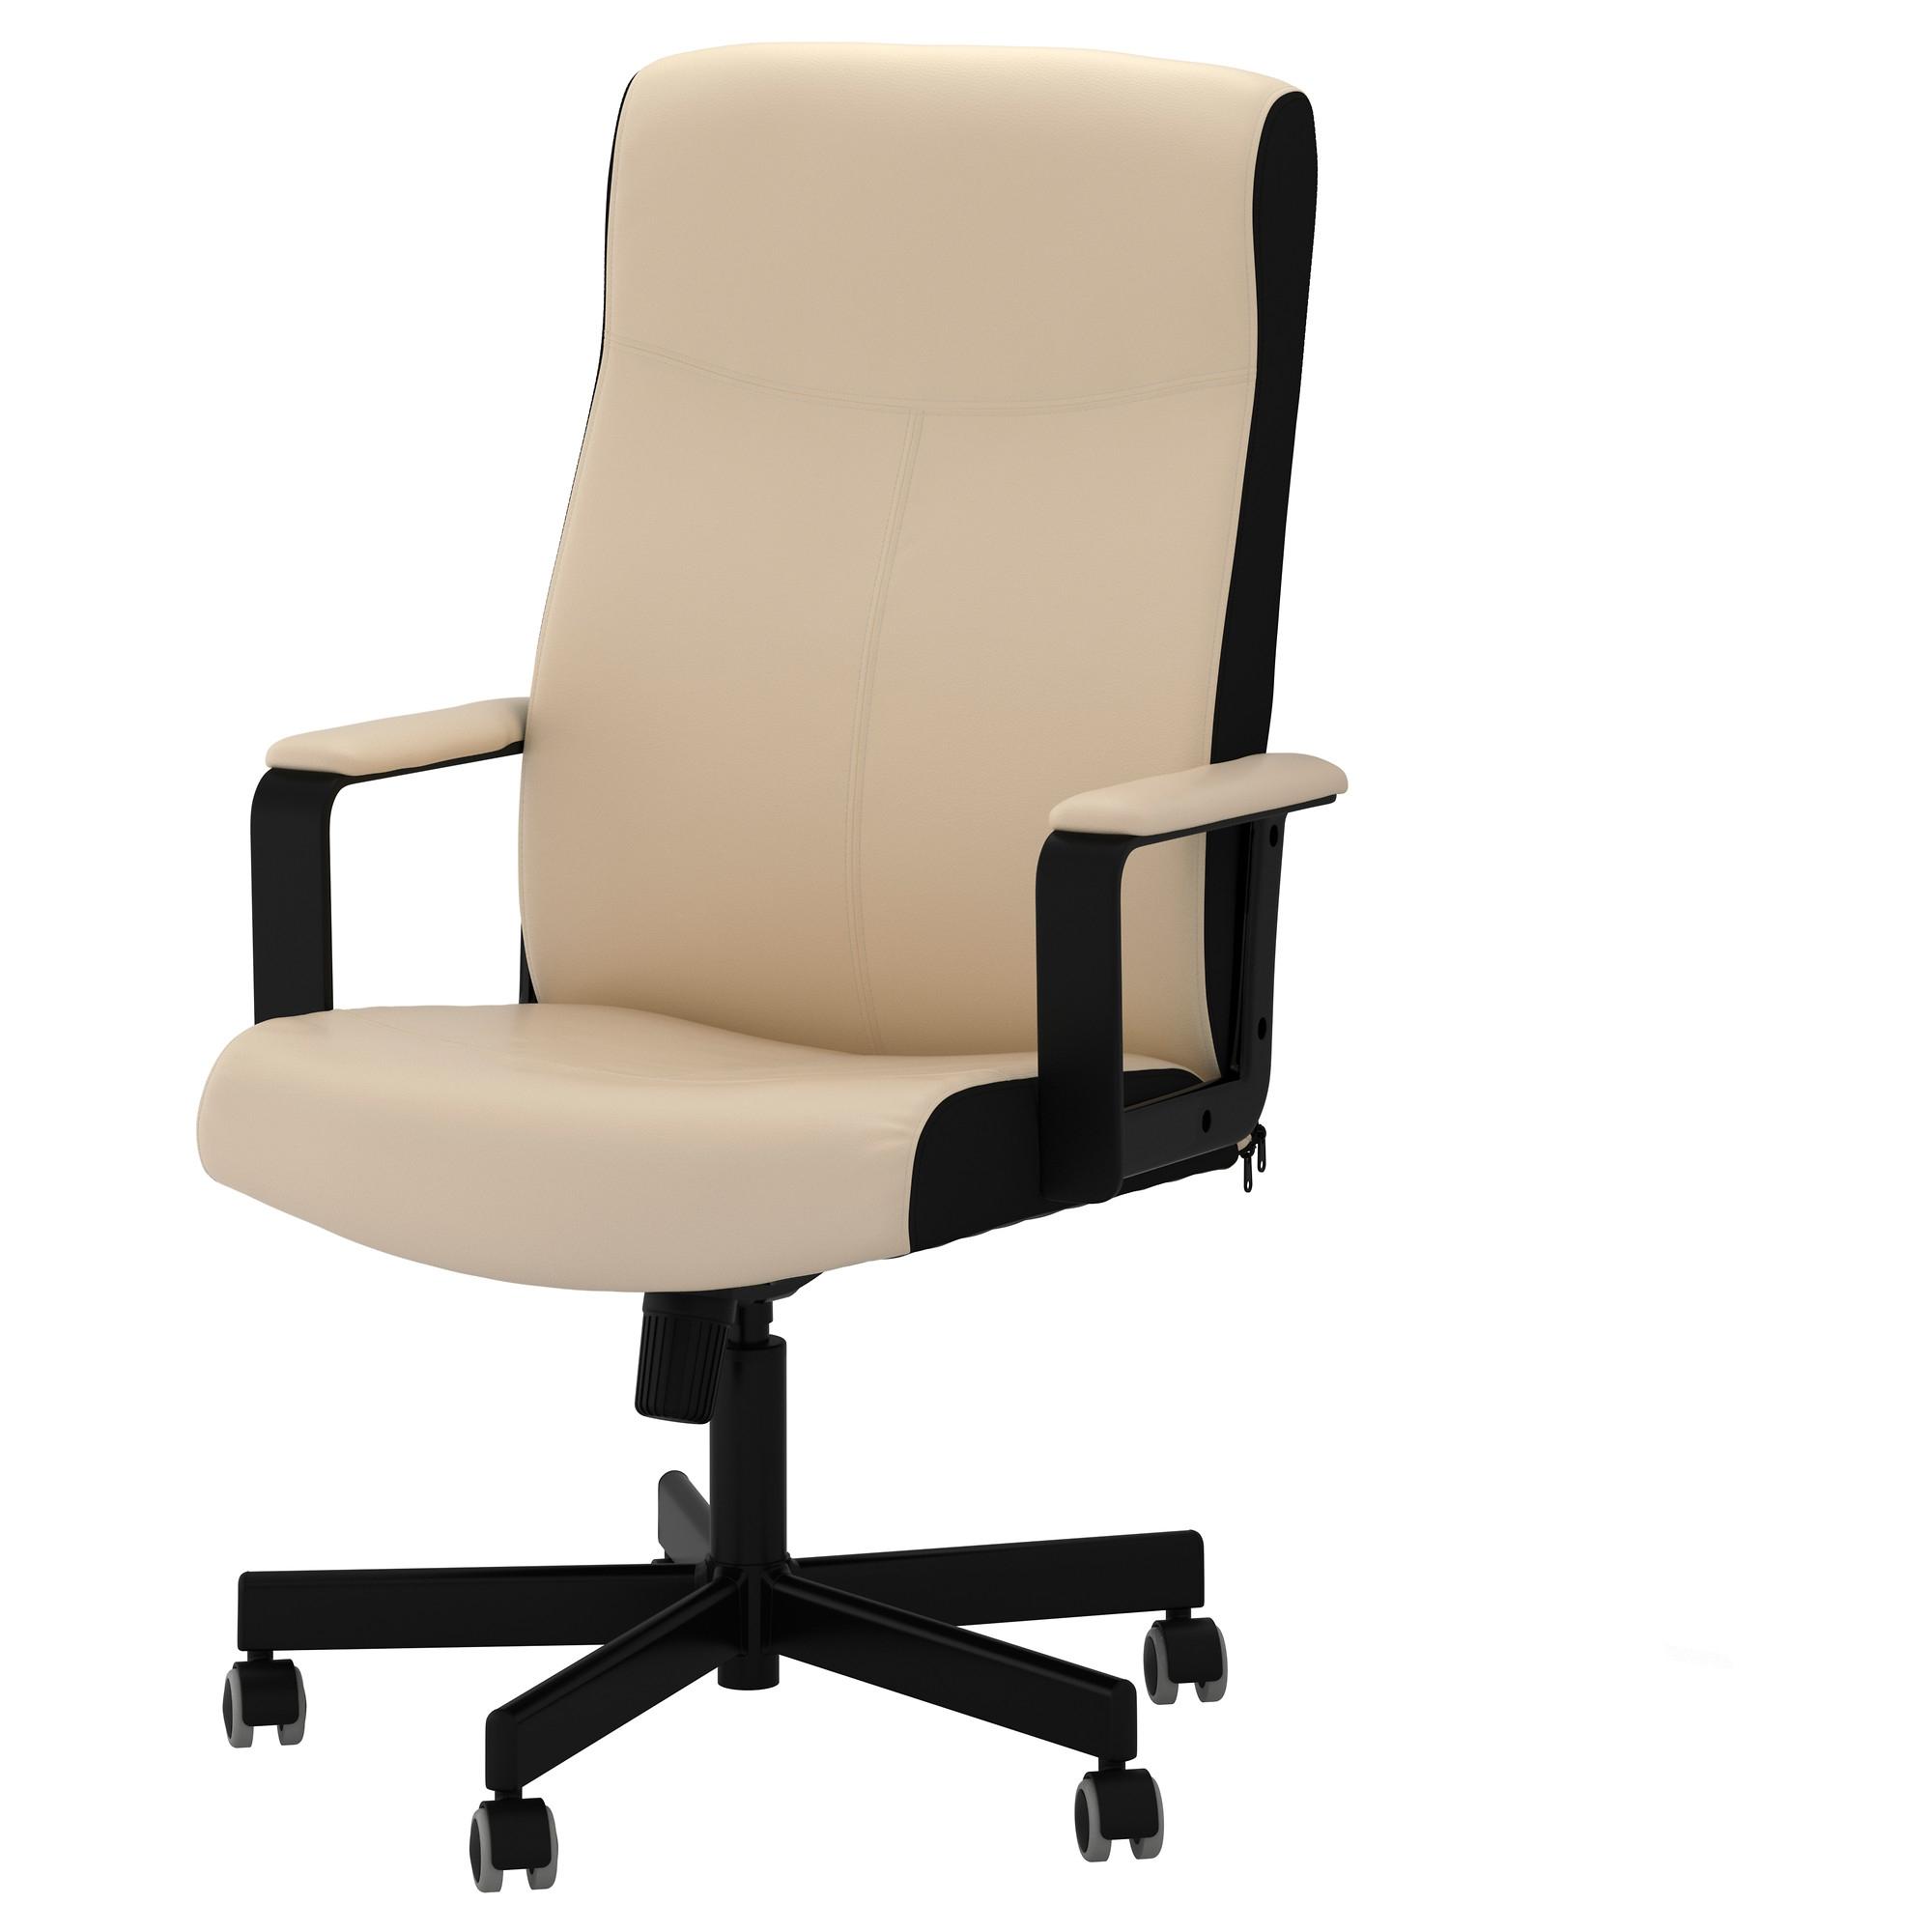 Malkolm silla giratoria negro beige - Sillas de exterior ikea ...